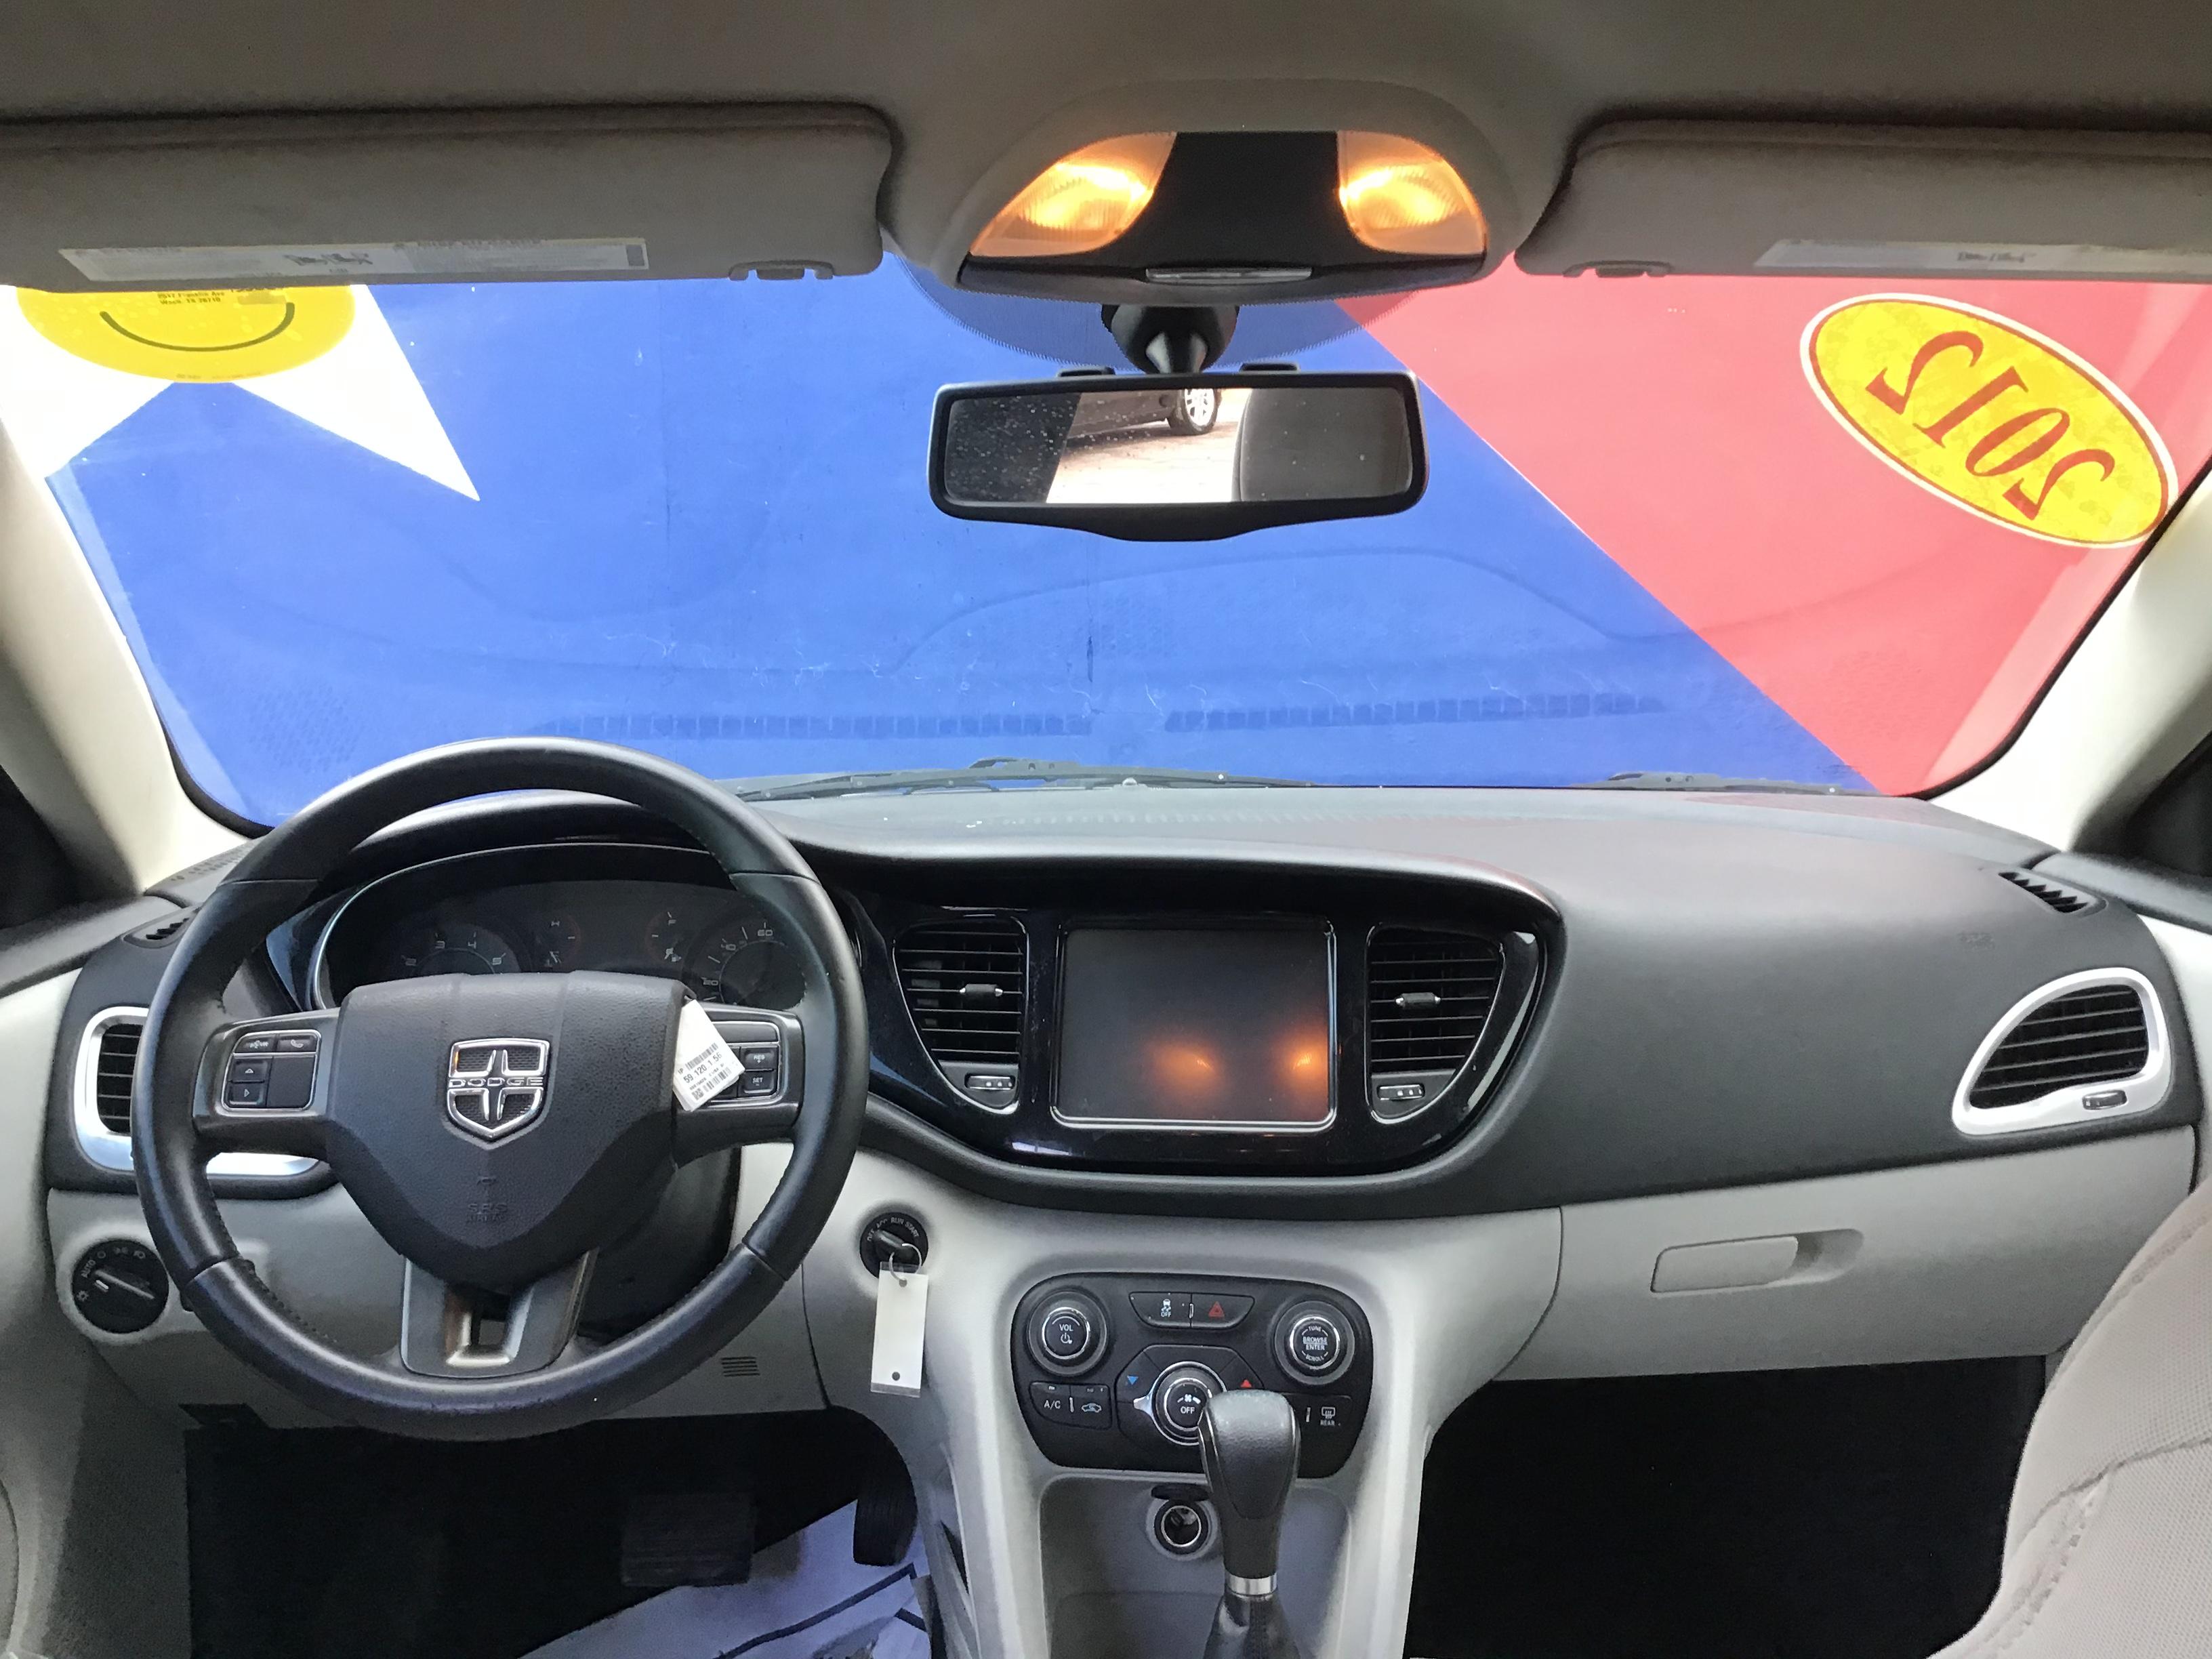 used vehicle - Sedan (4-Door) DODGE DART 2013